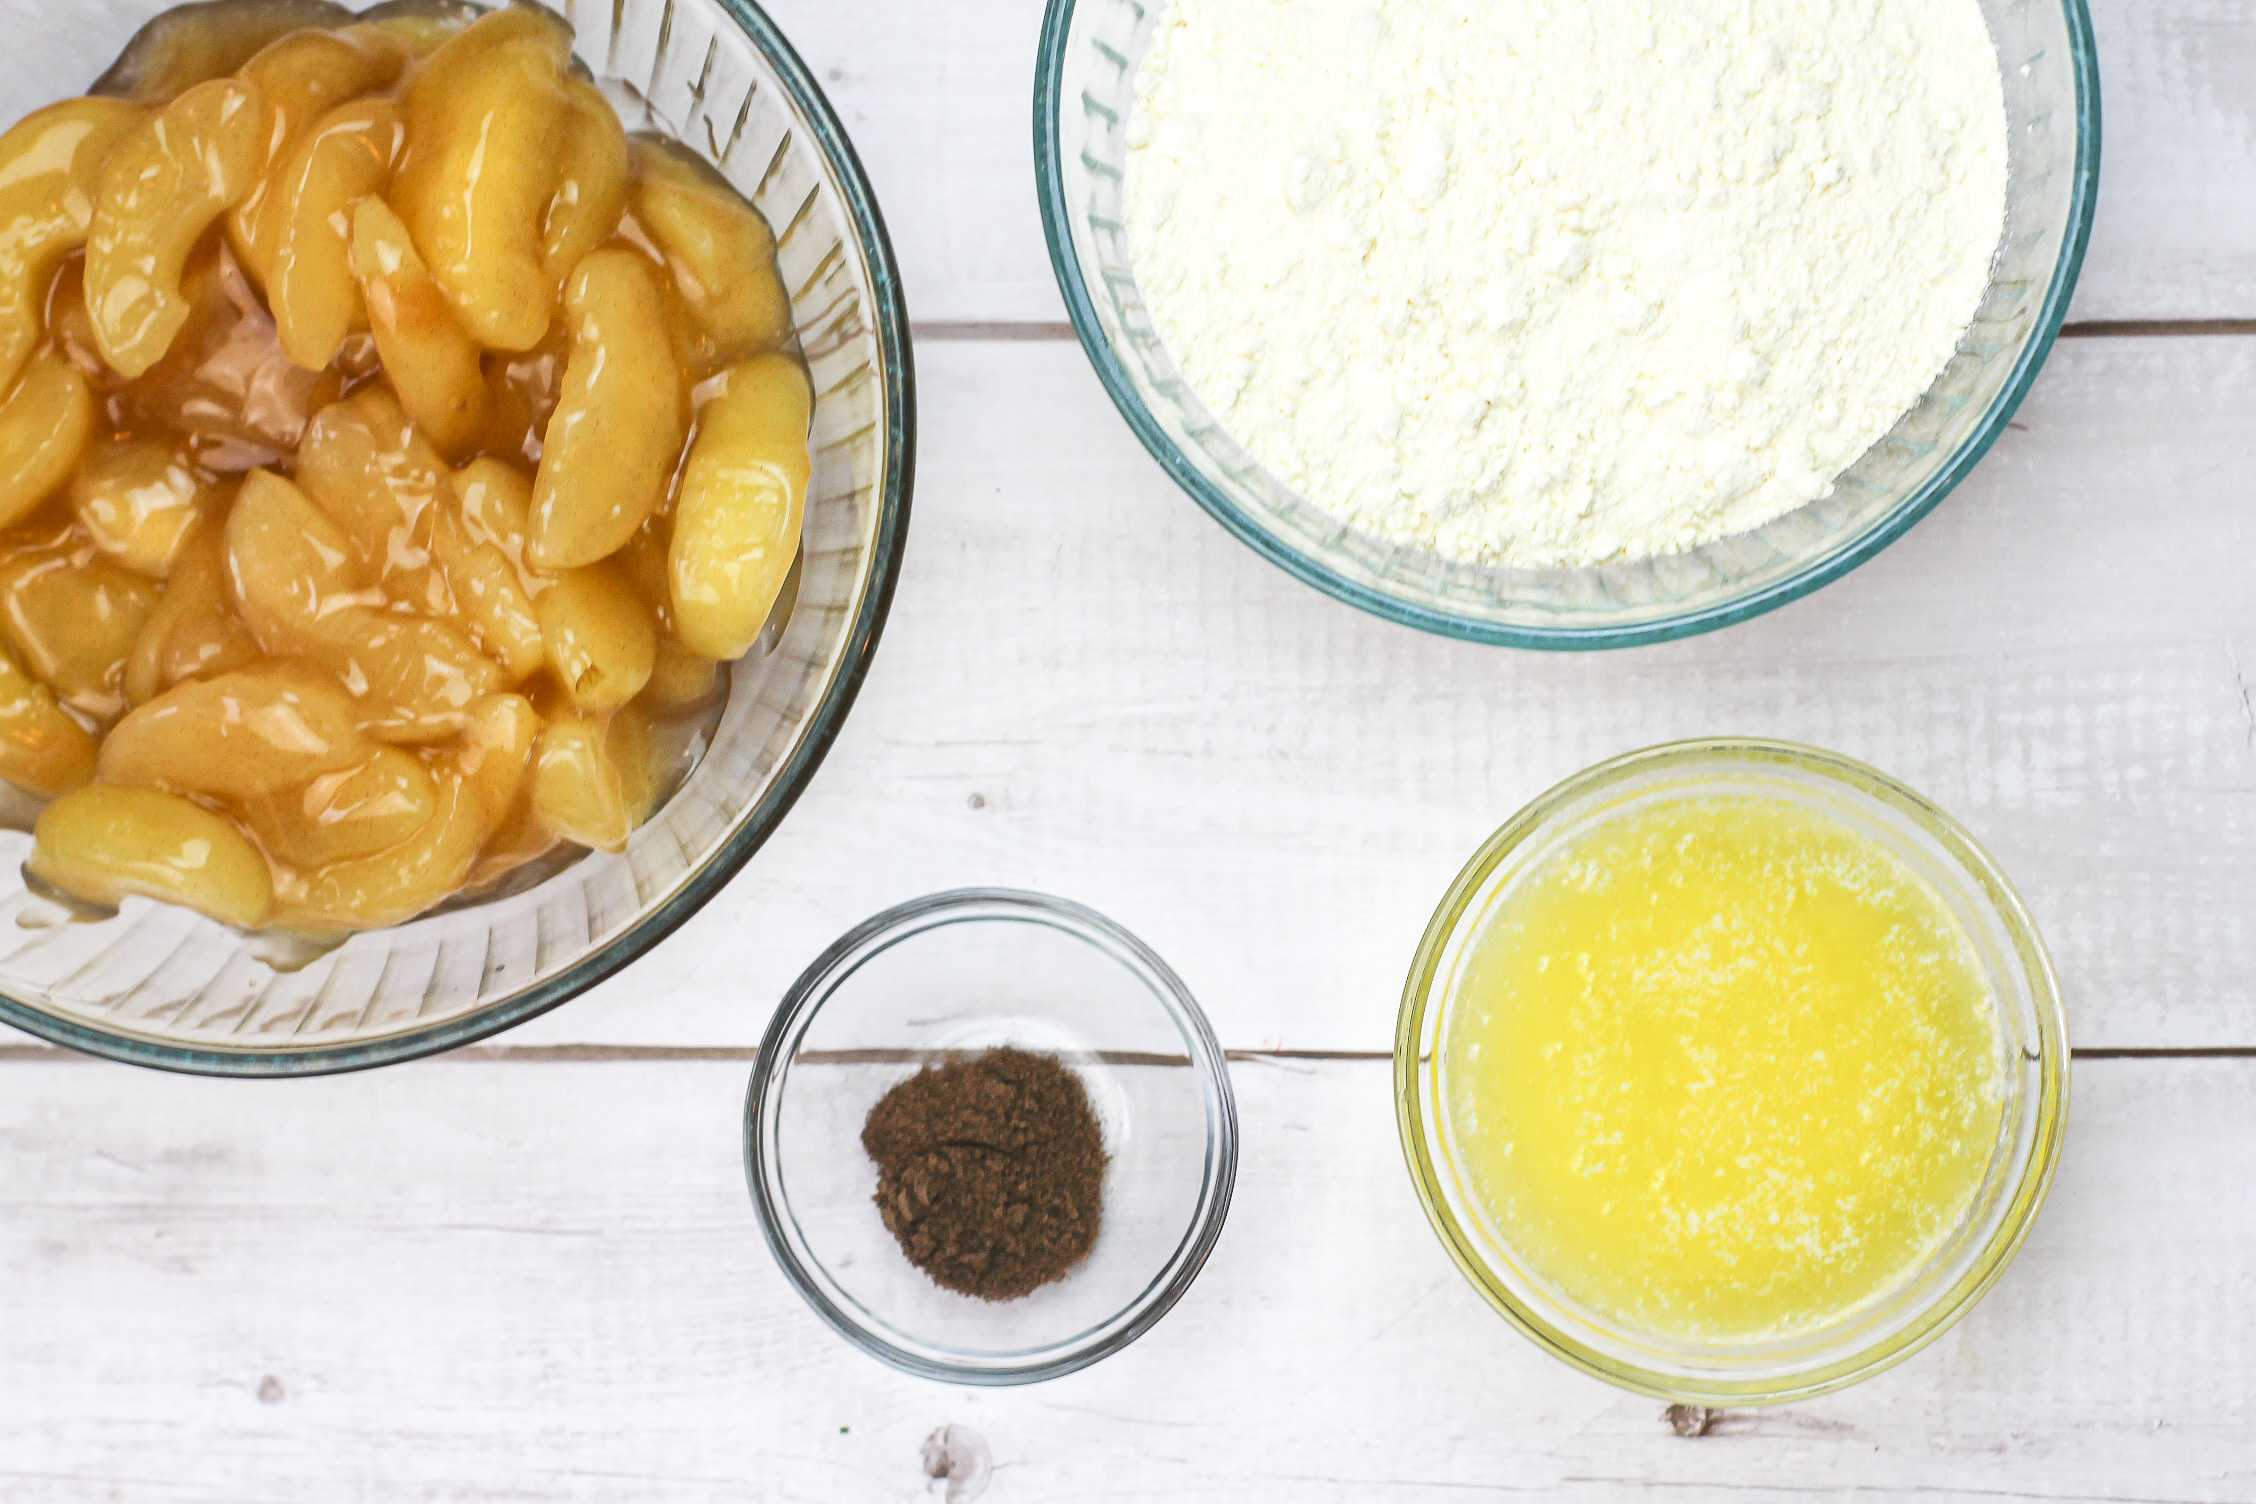 Easy Slow Cooker Apple Dump Cake Ingredients